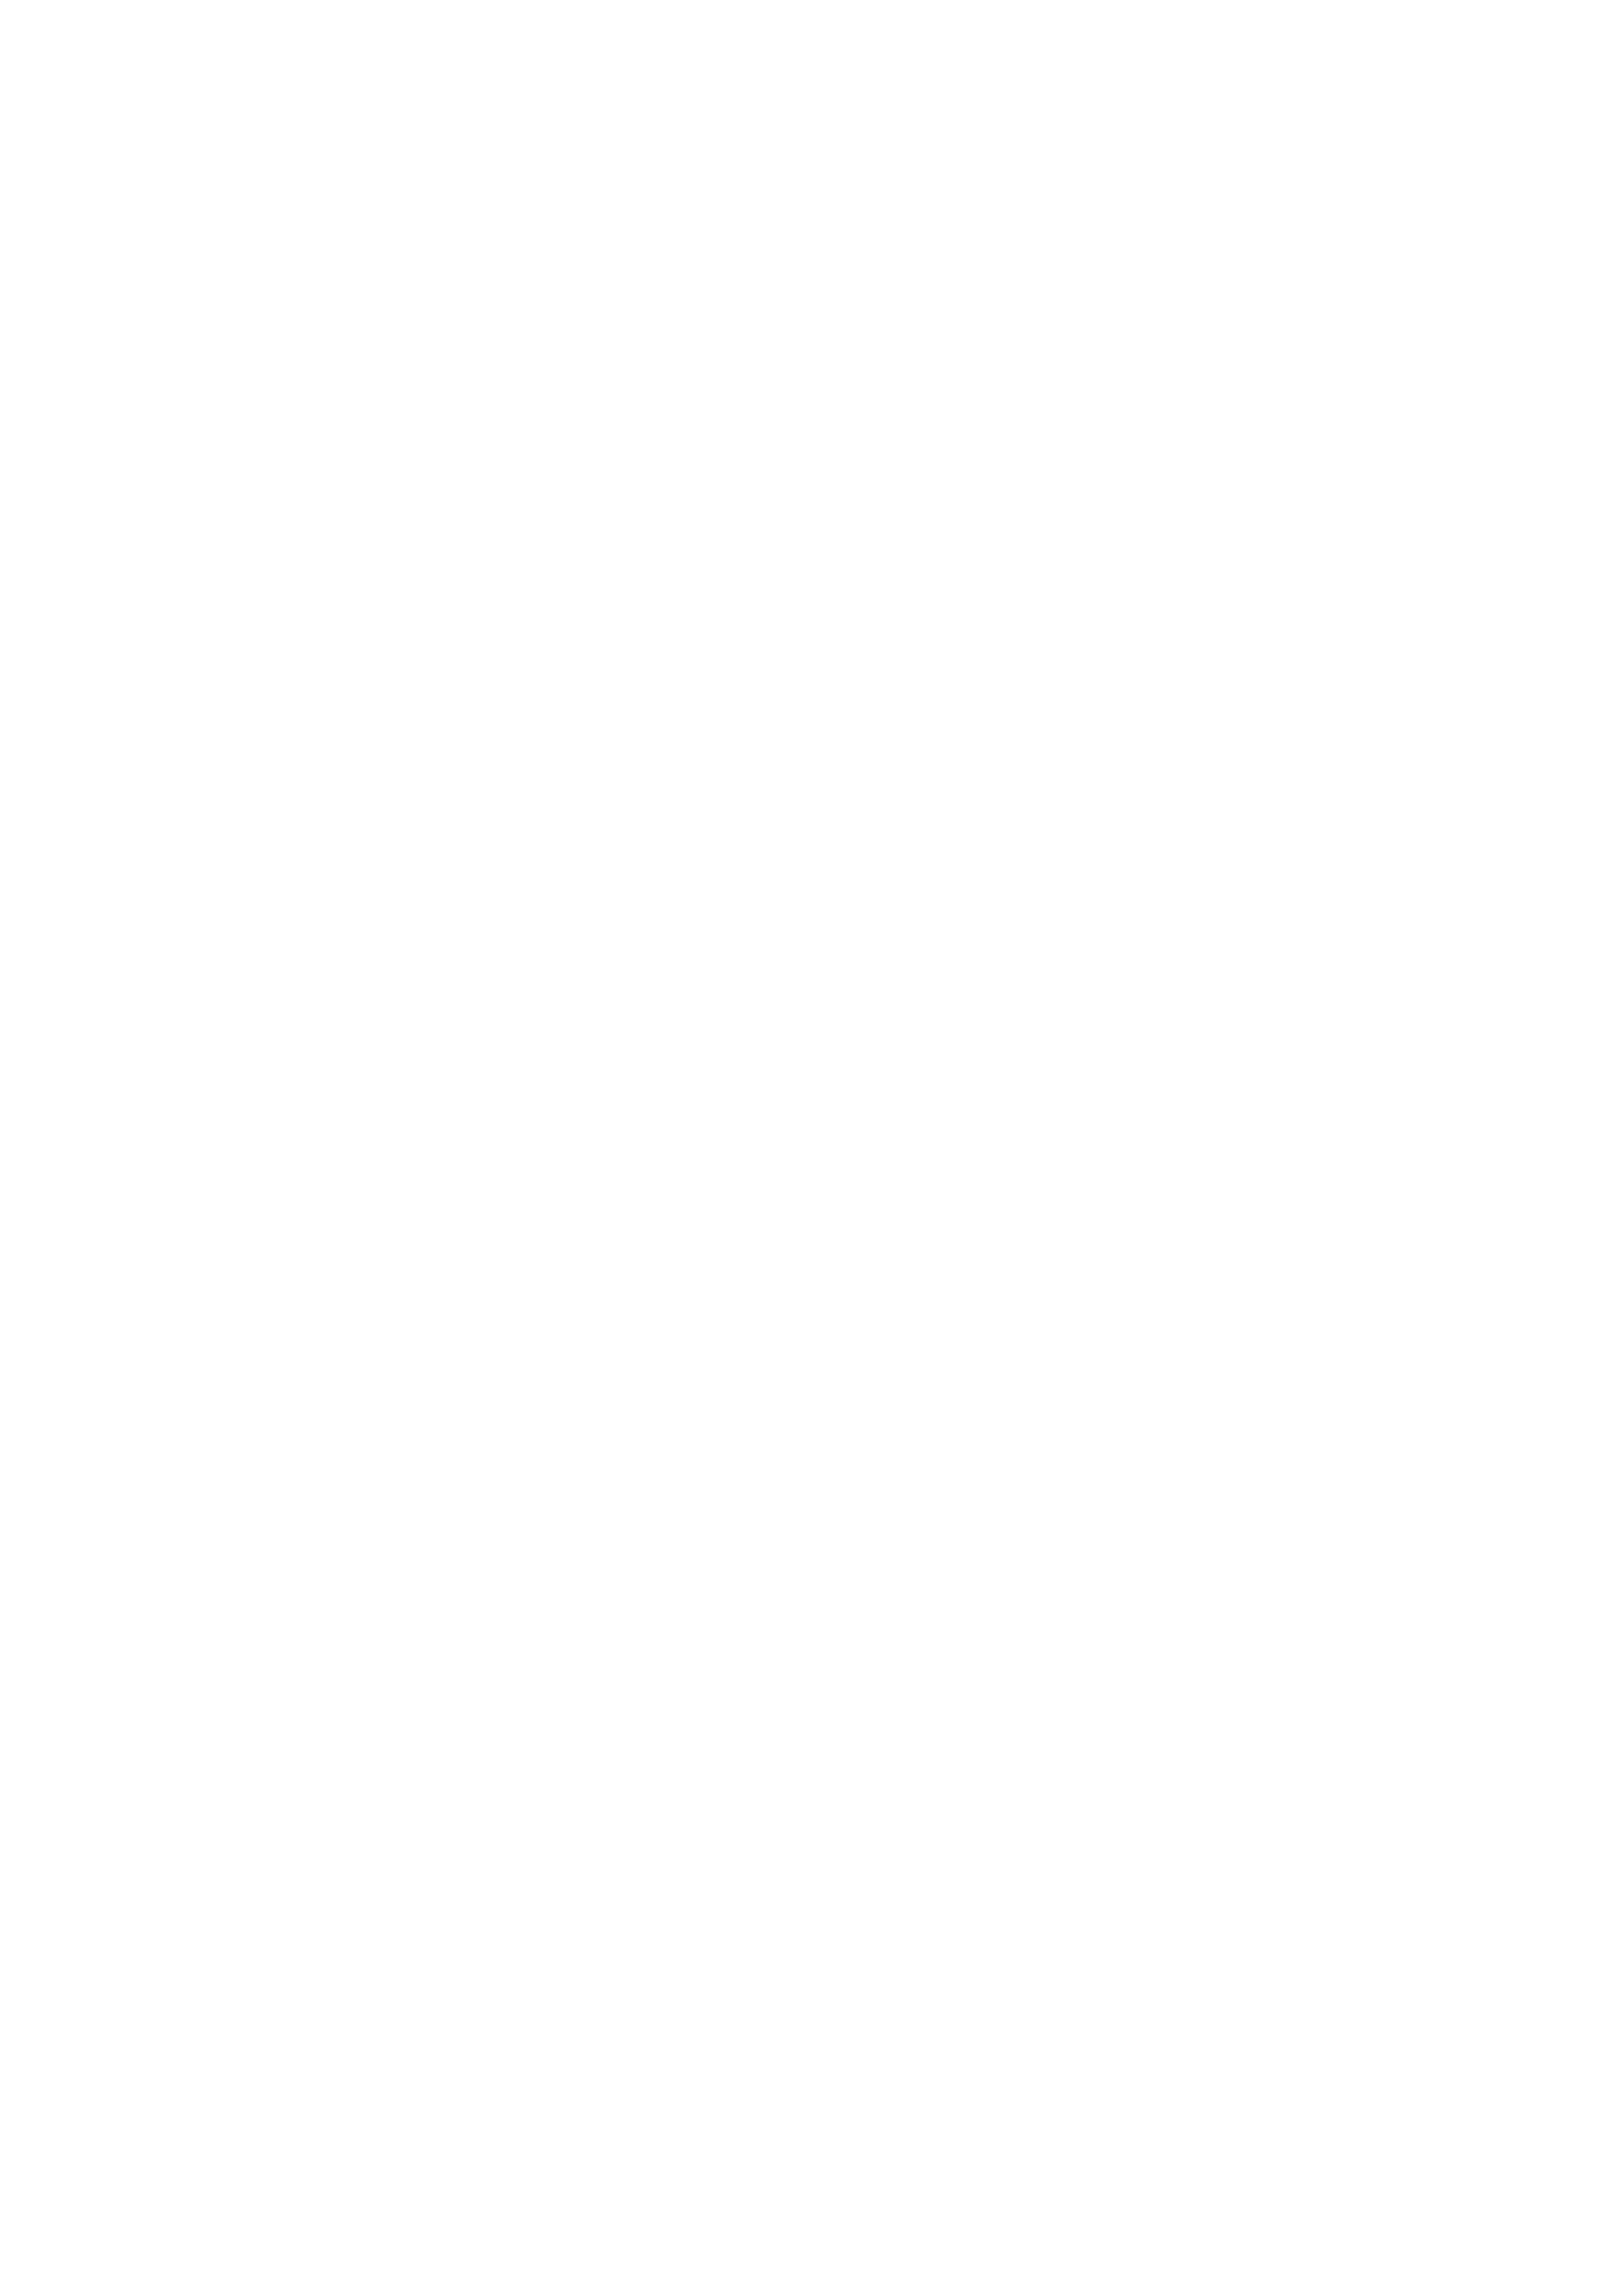 Samsonite - gazetka promocyjna ważna od 01.03.2020 do 31.12.2020 - strona 2.